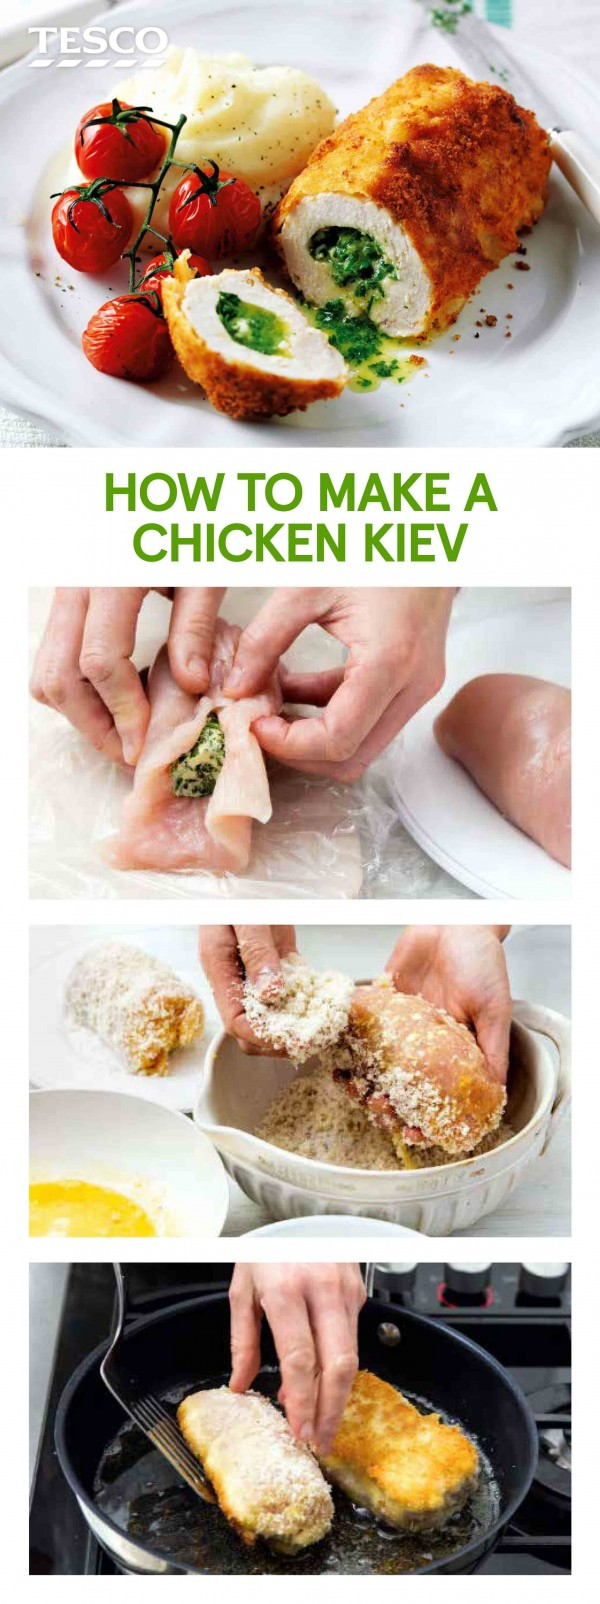 50 Best Chicken Recipes Ever - Check out this recipe for Chicken Kiev. Yummy! #RecipeIdeas @recipes_to_go